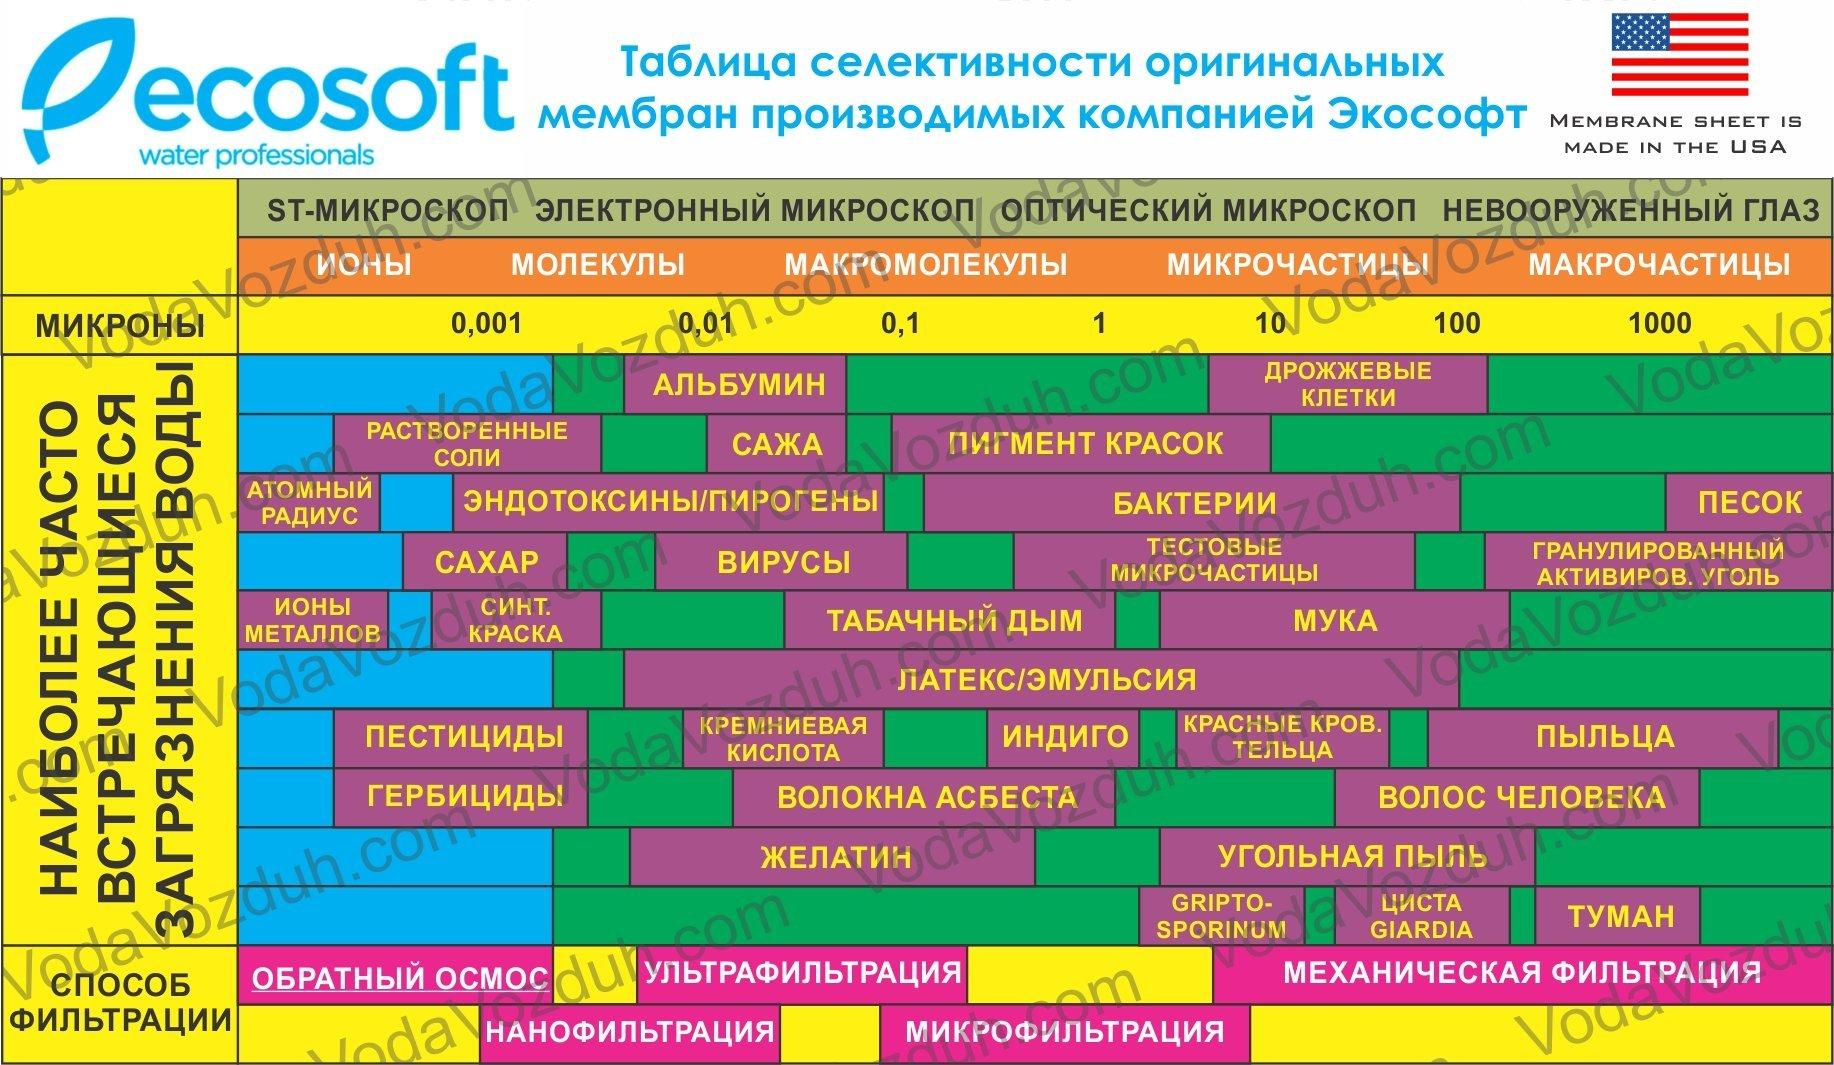 Ecosoft 75 GPD CP-1812-75 характеристики